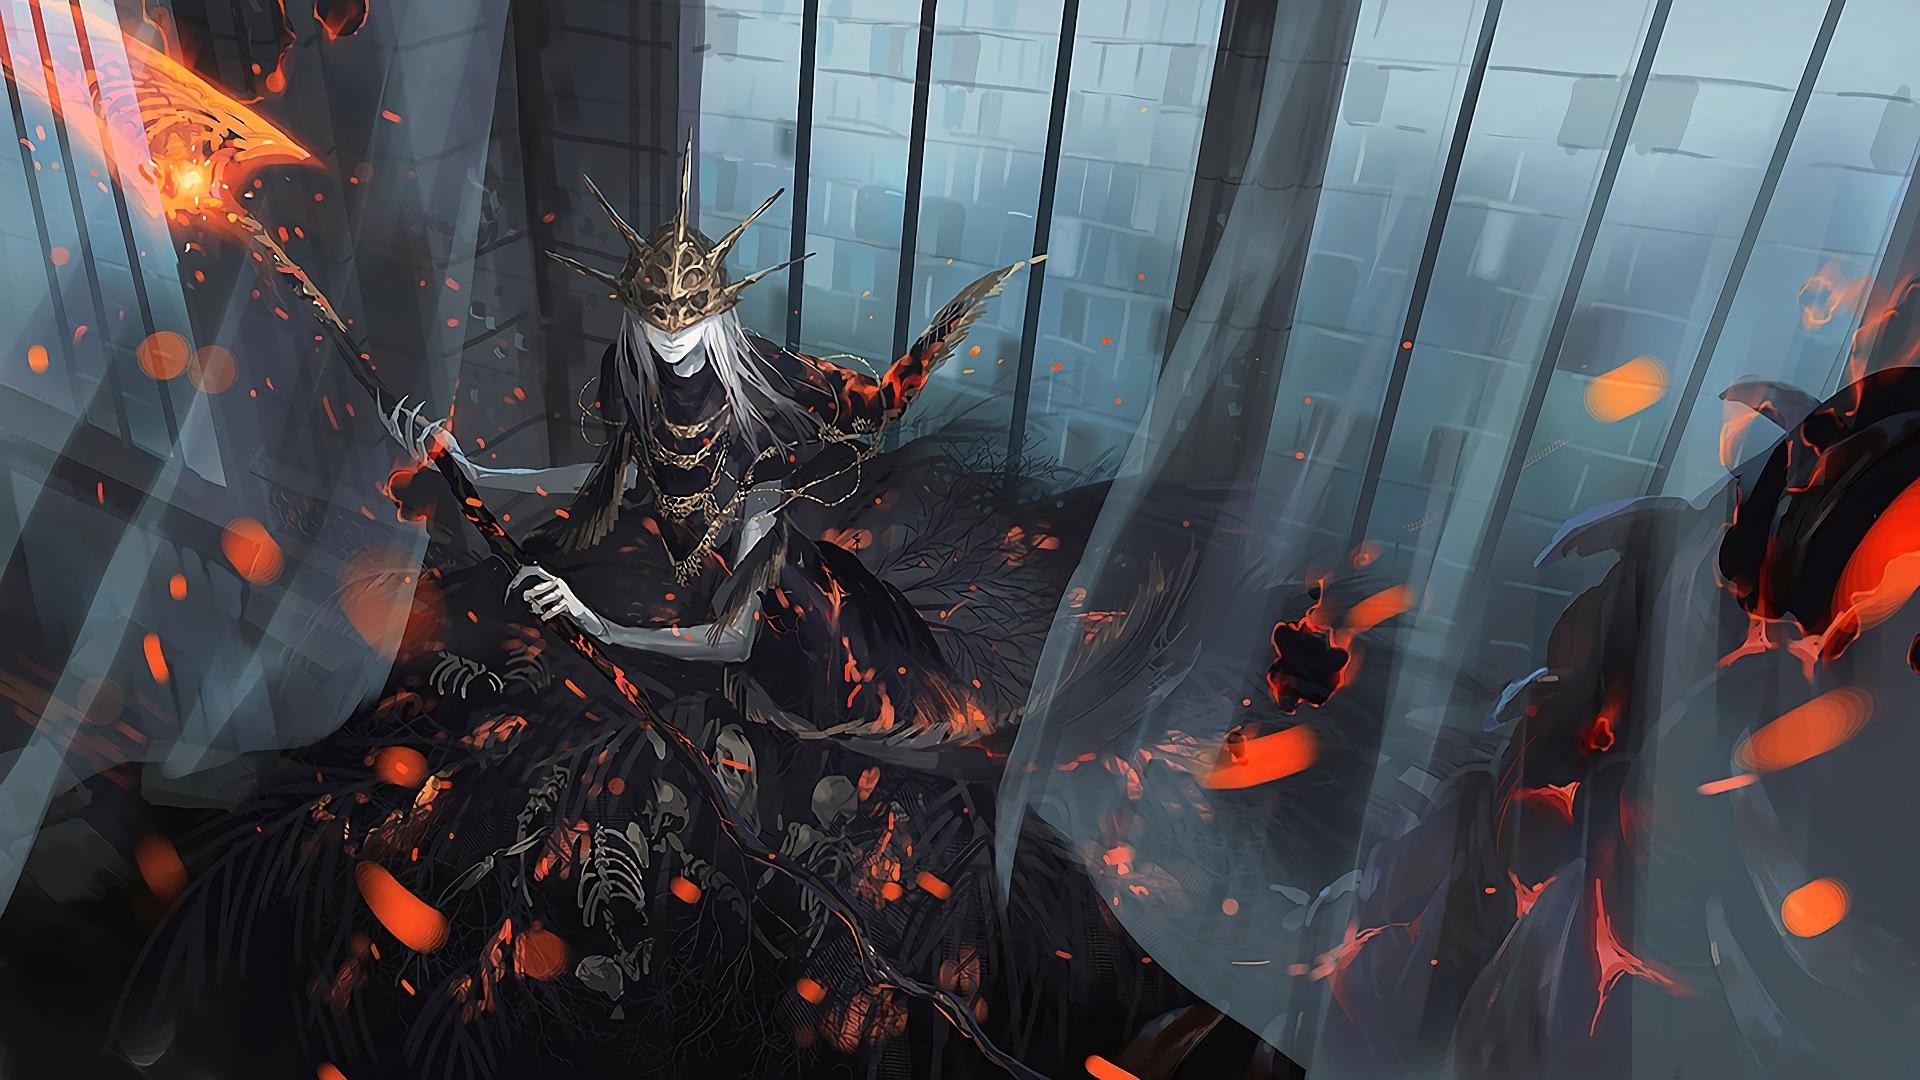 Dark Souls background wallpaper